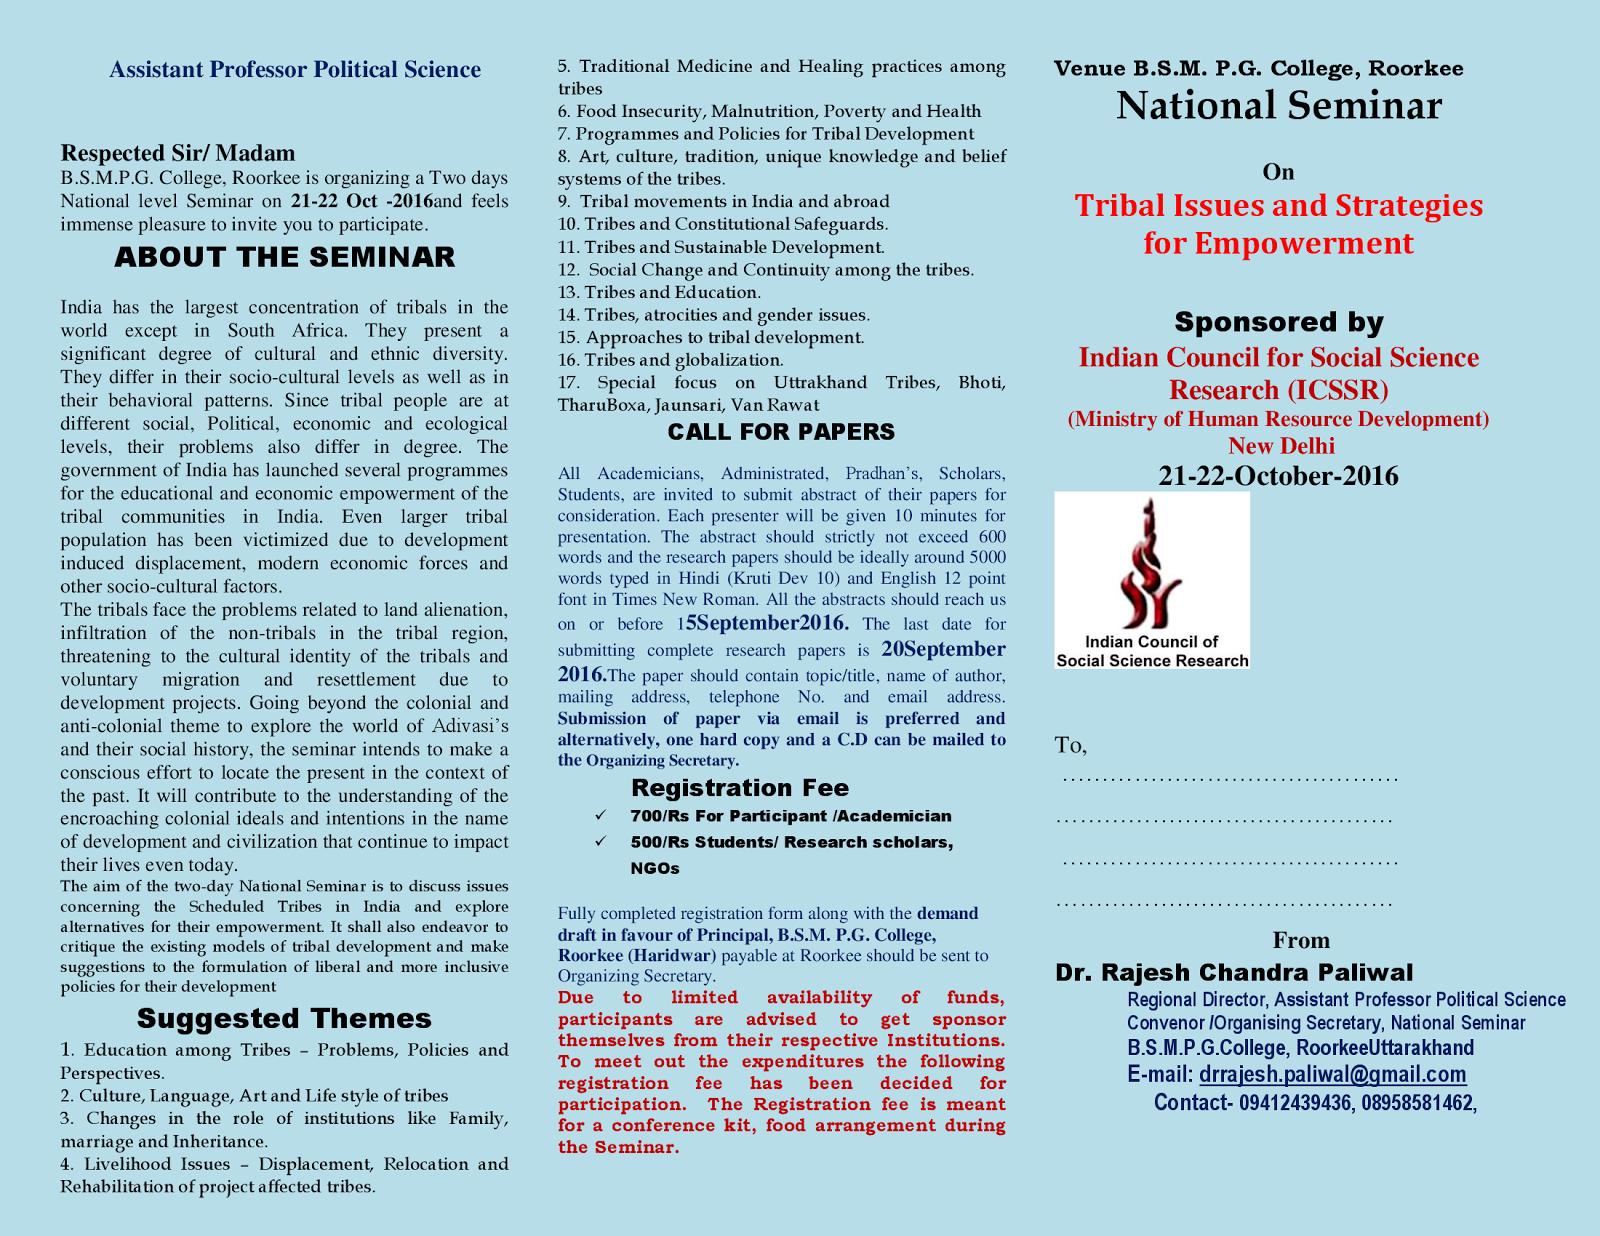 The Social Science Informer: ICSSR Sponsored National